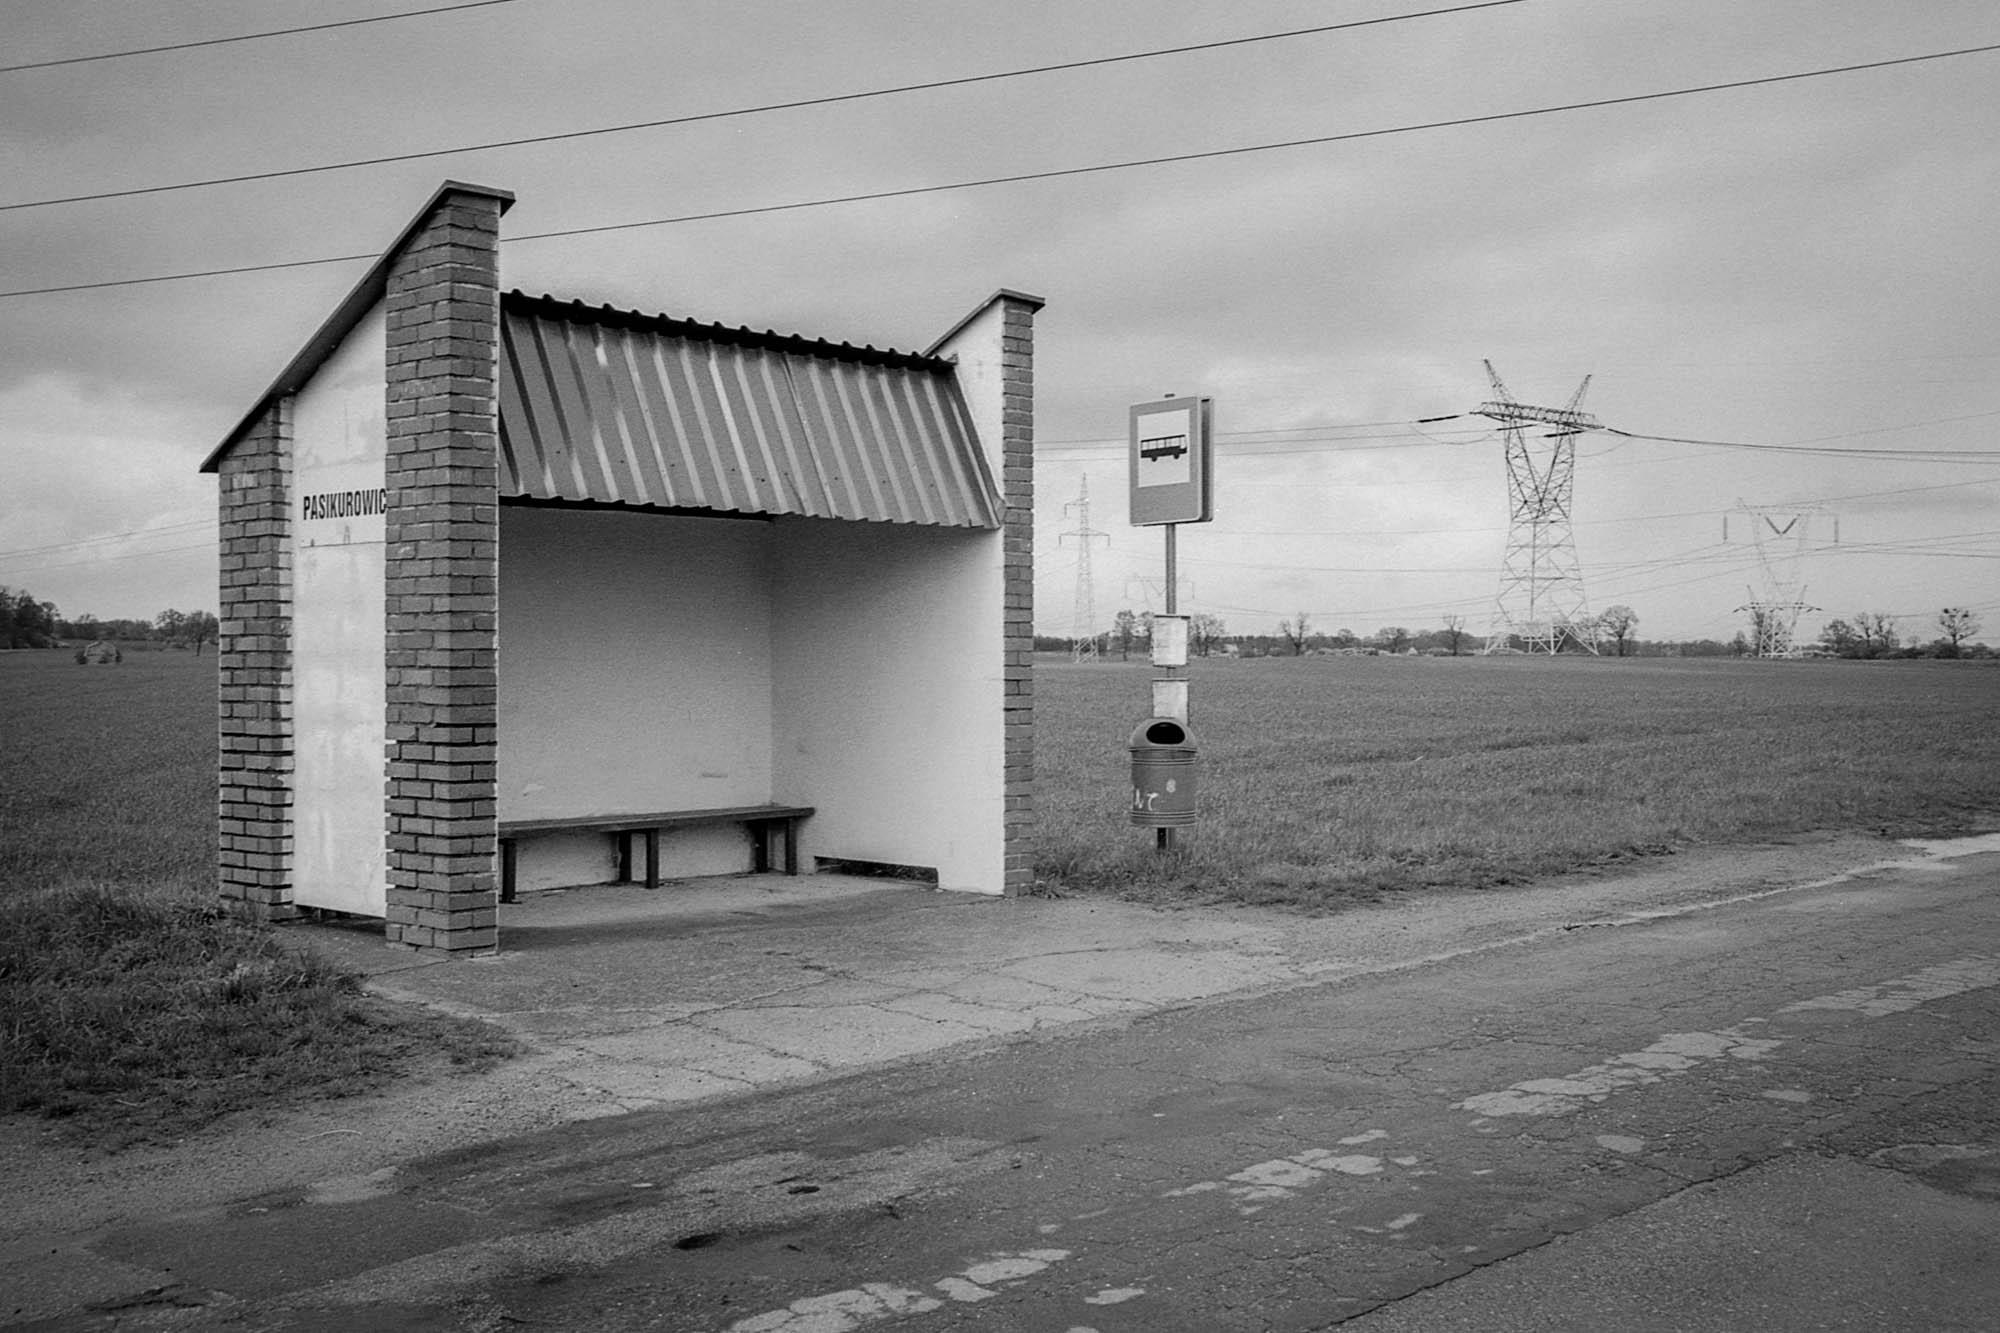 Leica FP4 1 030